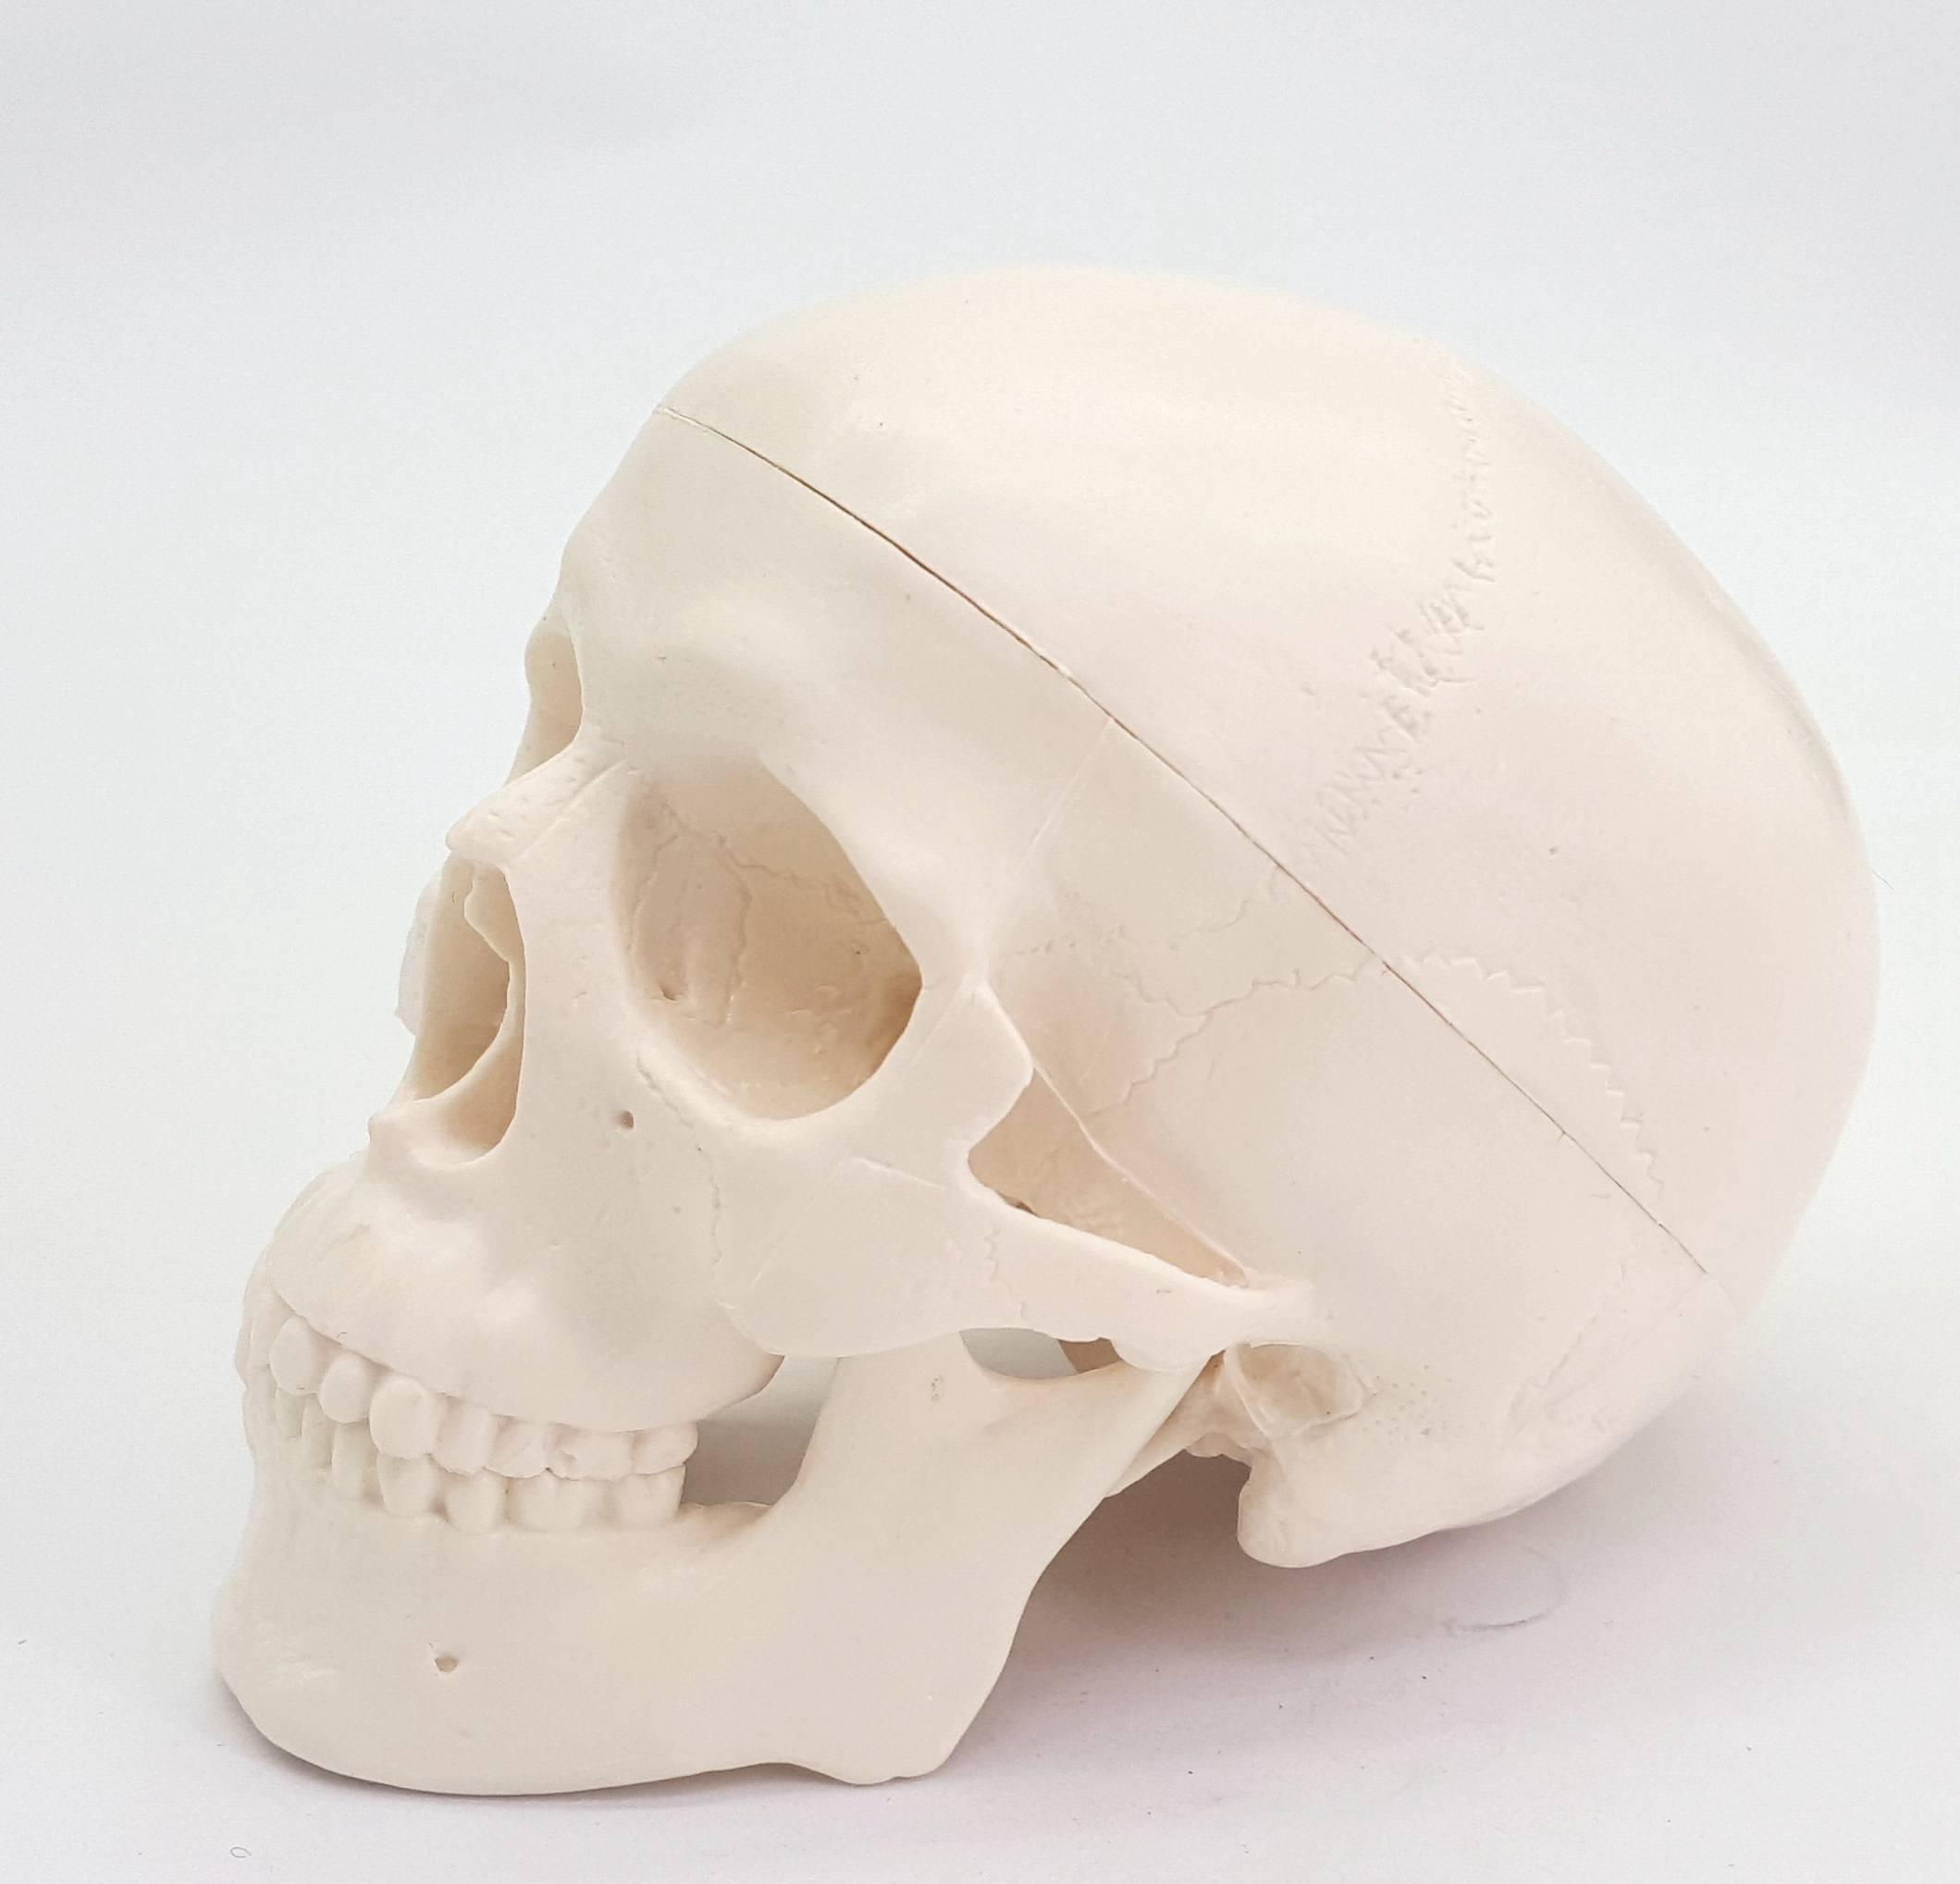 anatomico-humano-modelo-medicina-craneo-anatomico-humano-anatomia-cabeza-estudiar-ensenanza-de-la-anatomia-suministros-modelo-de-craneo